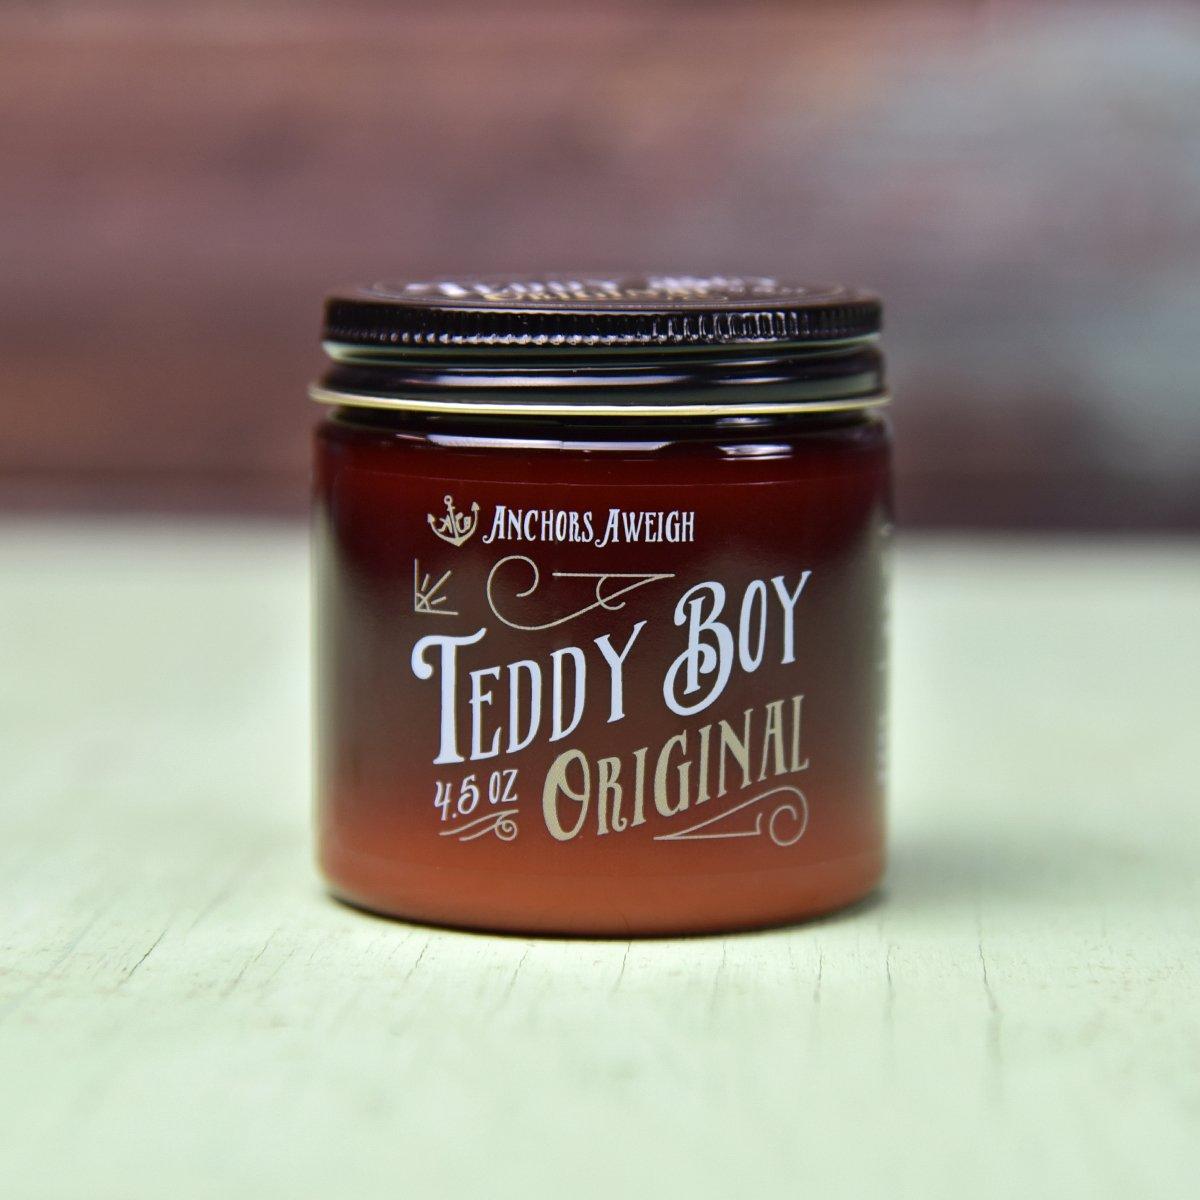 Anchors Aweigh Hair Co • Teddy Boy Original Pomade • $22